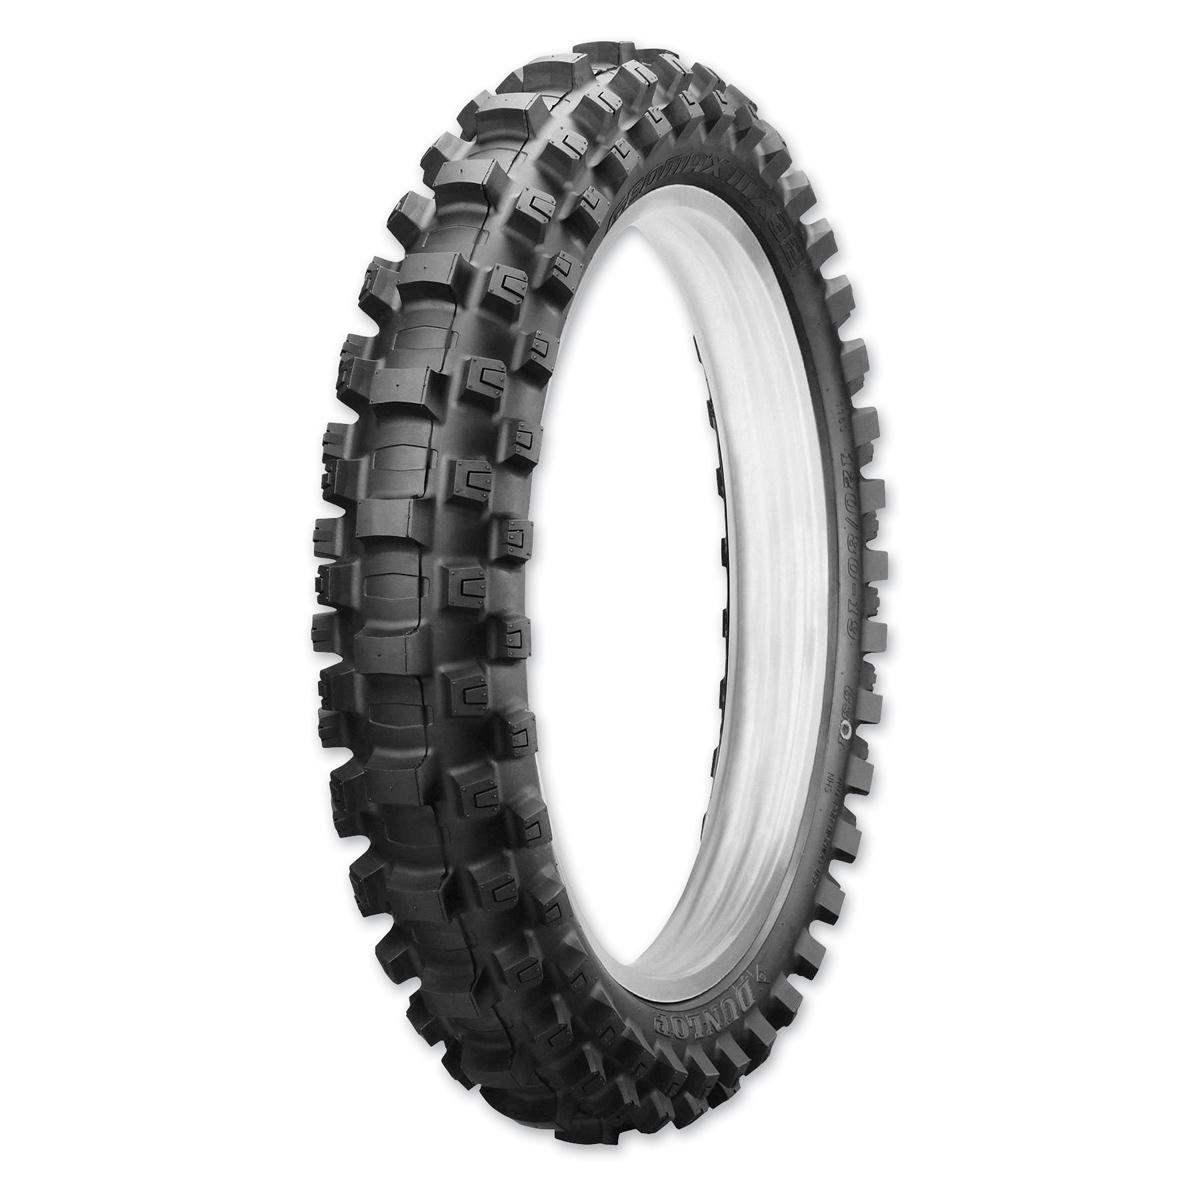 Dunlop MX3S/32 90/100-16 S/T-I/T Rear Tire